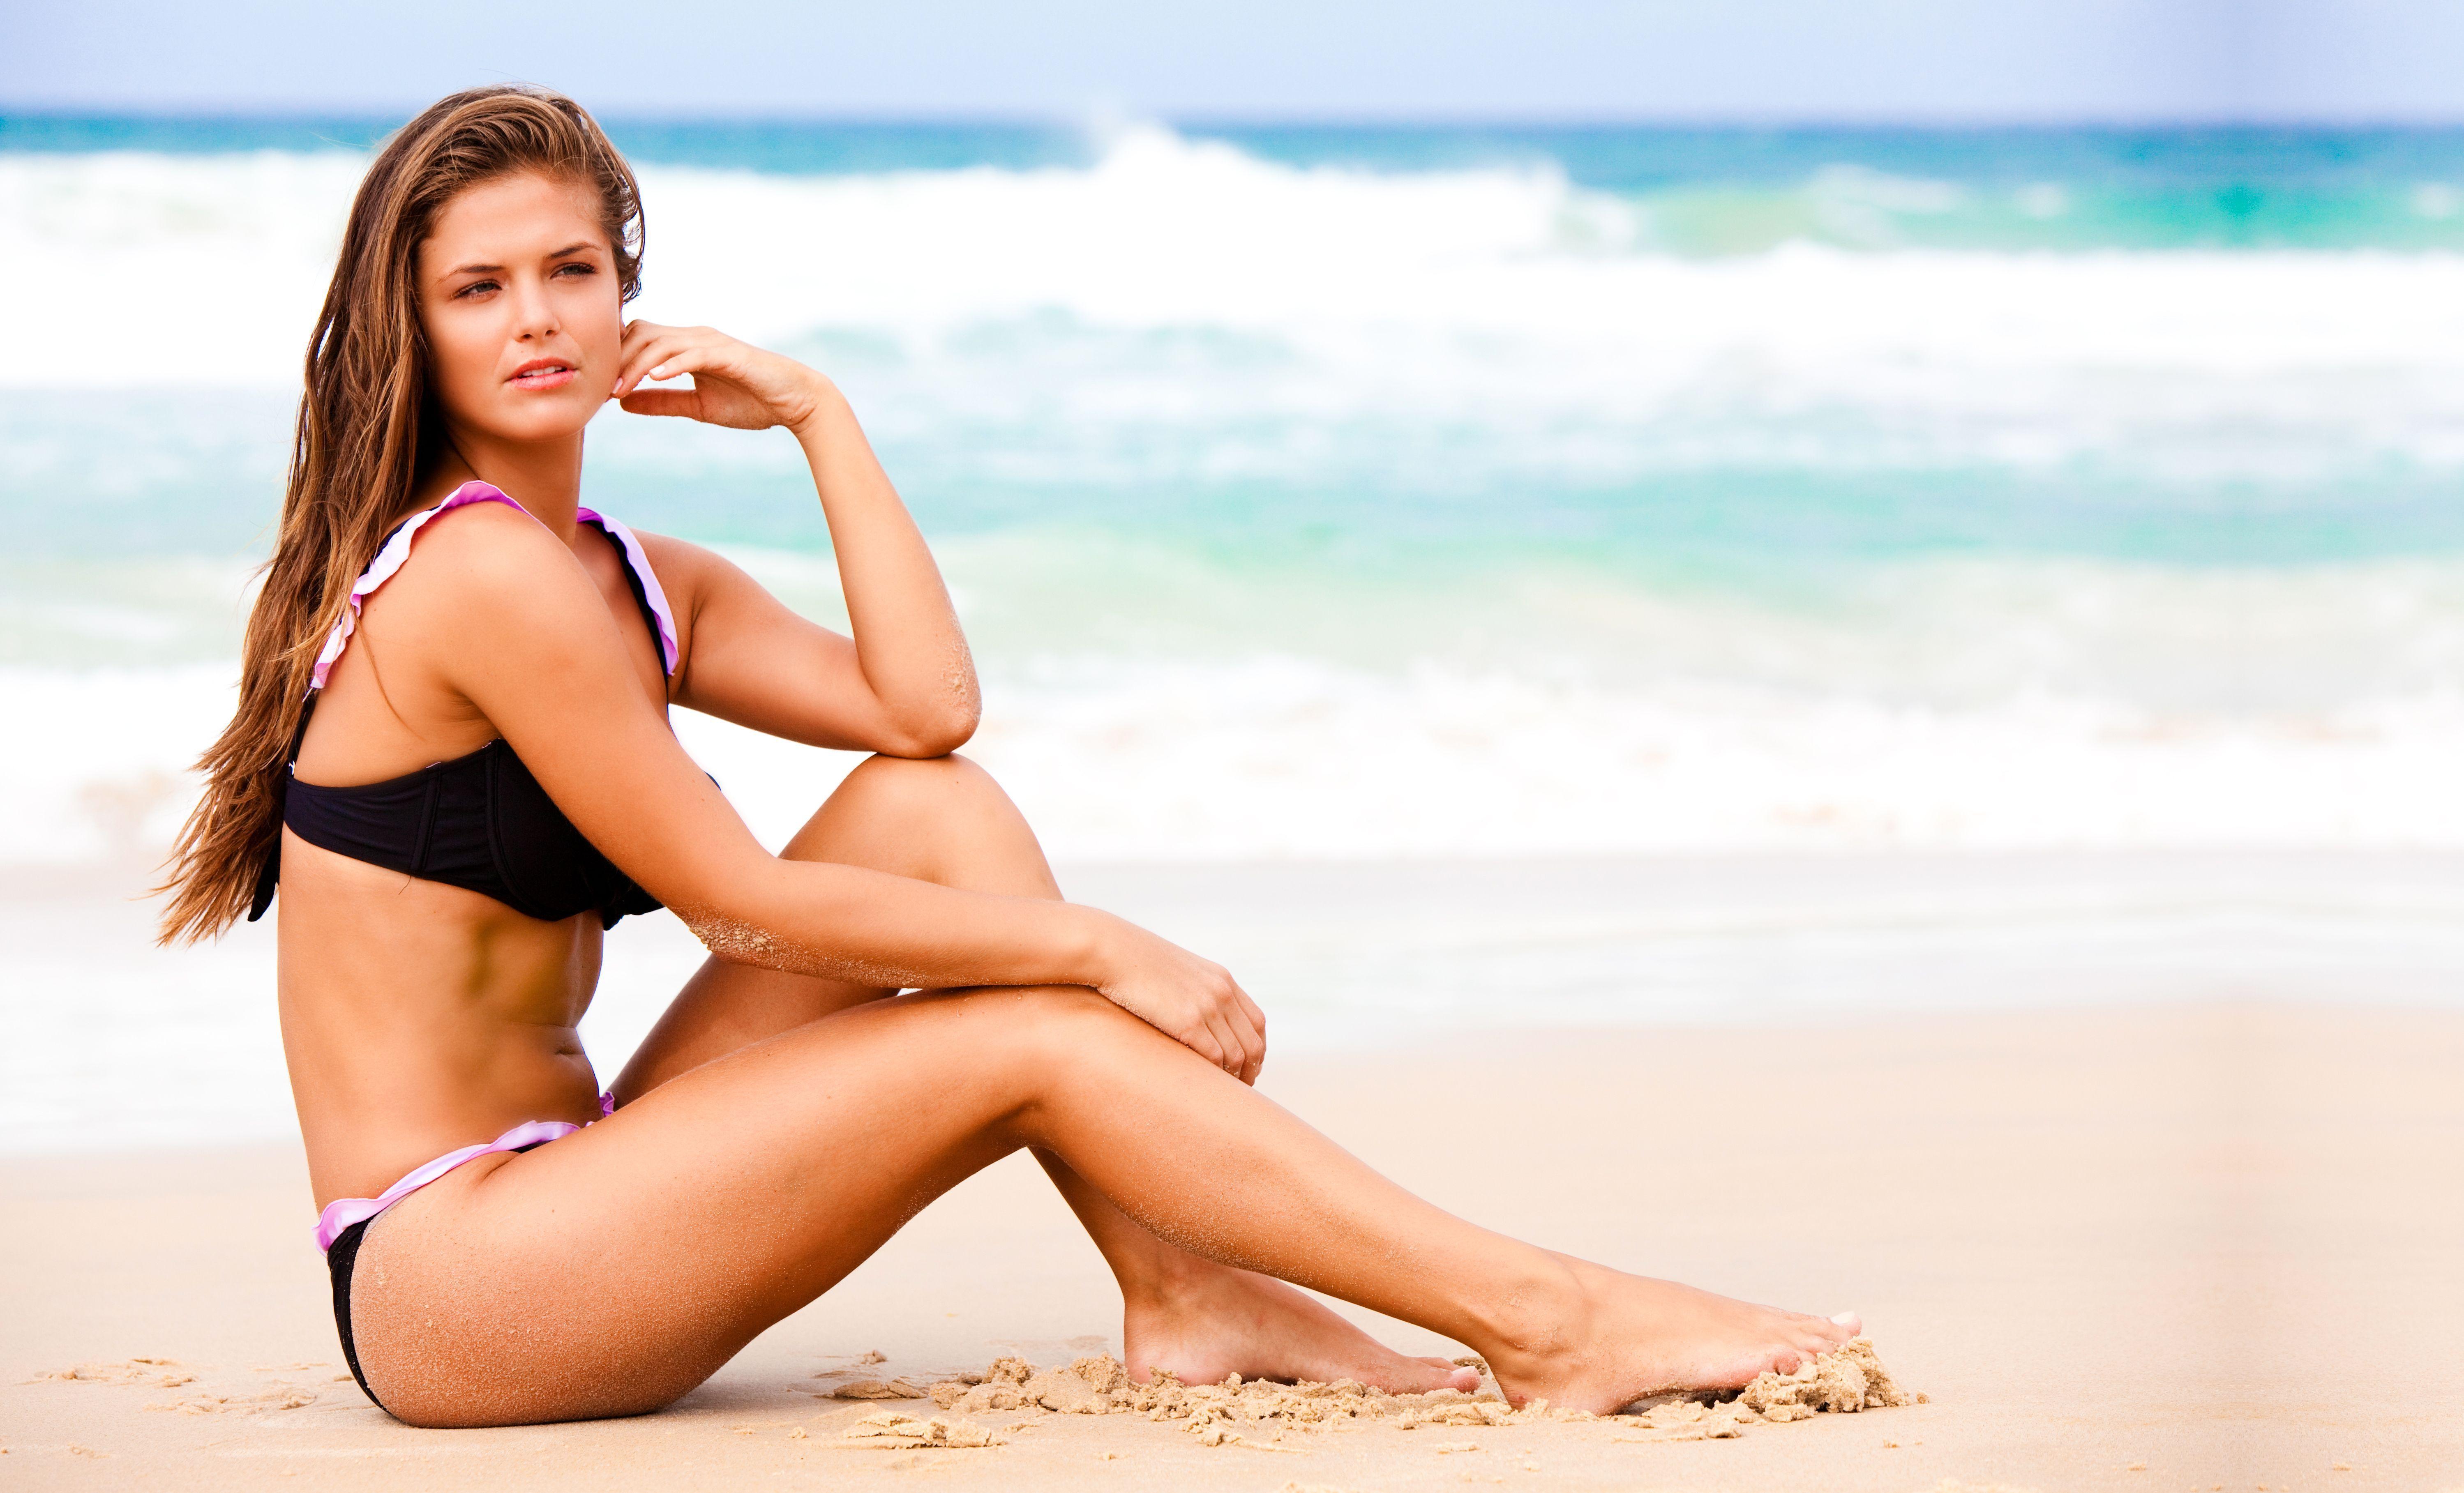 Beautiful sexy girl on beach free wallpaper